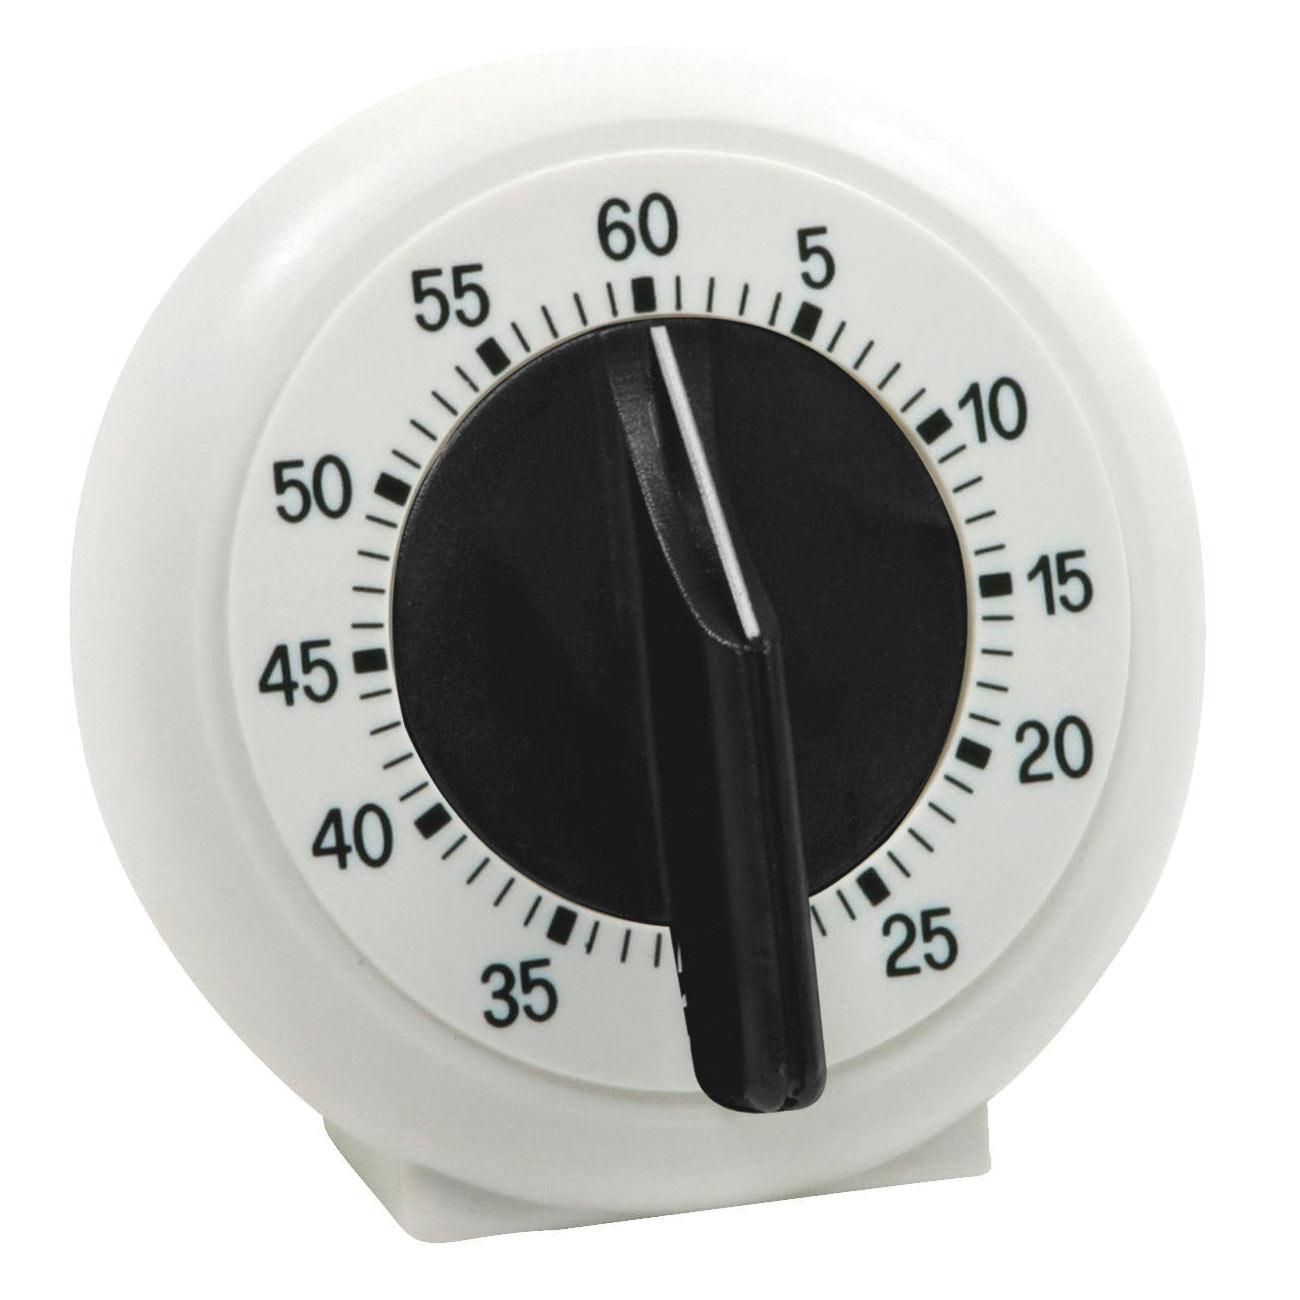 Taylor Large-Number Long-Ring Mechanical Timer